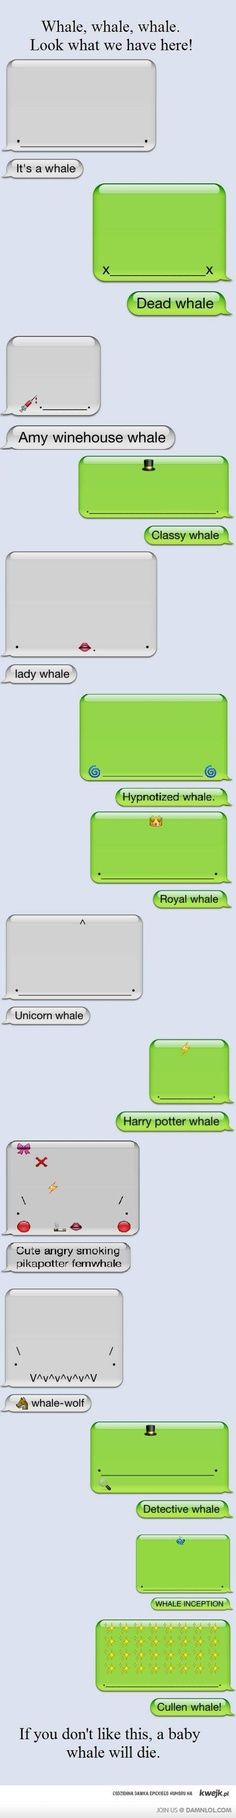 #Ballena #whatsapp #humor